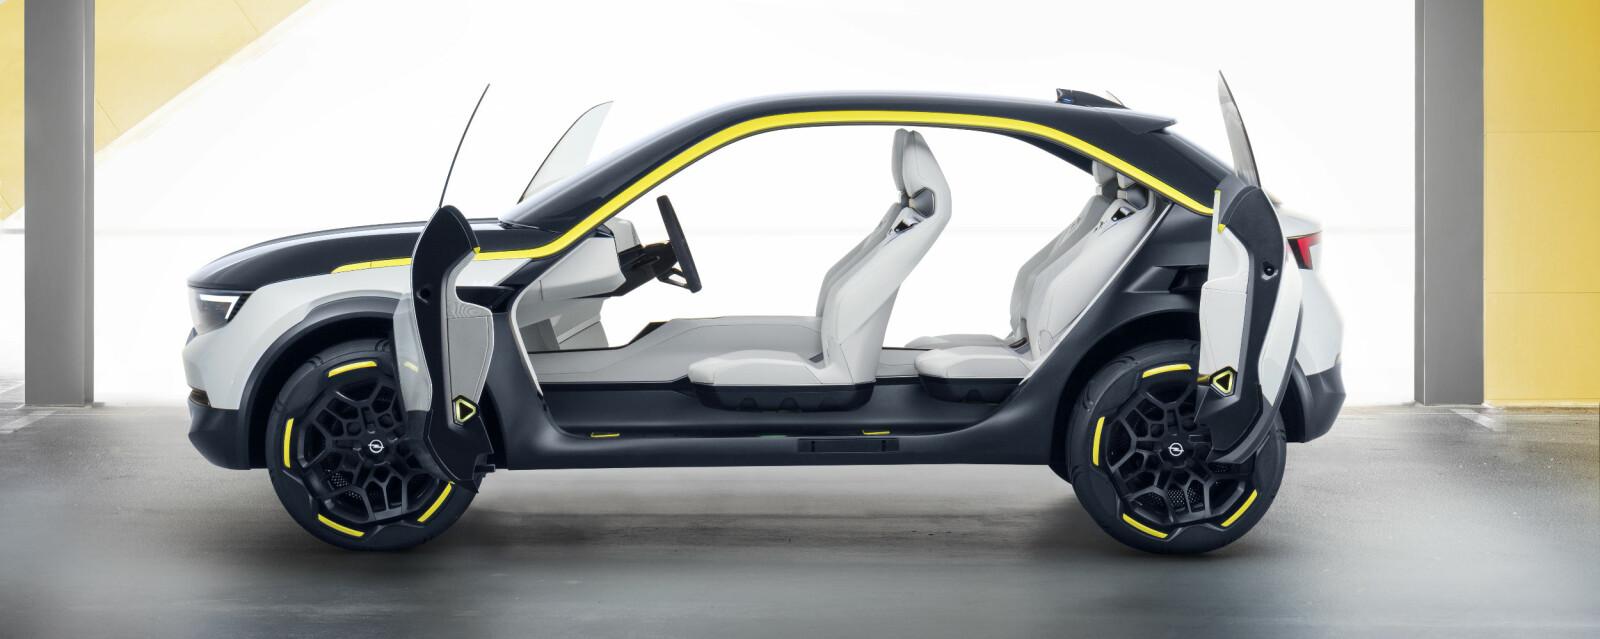 <b>OPEL GT X EXPERIMENTAL: </b>Slik presenterer Opel designretningen for sin nye elbil.